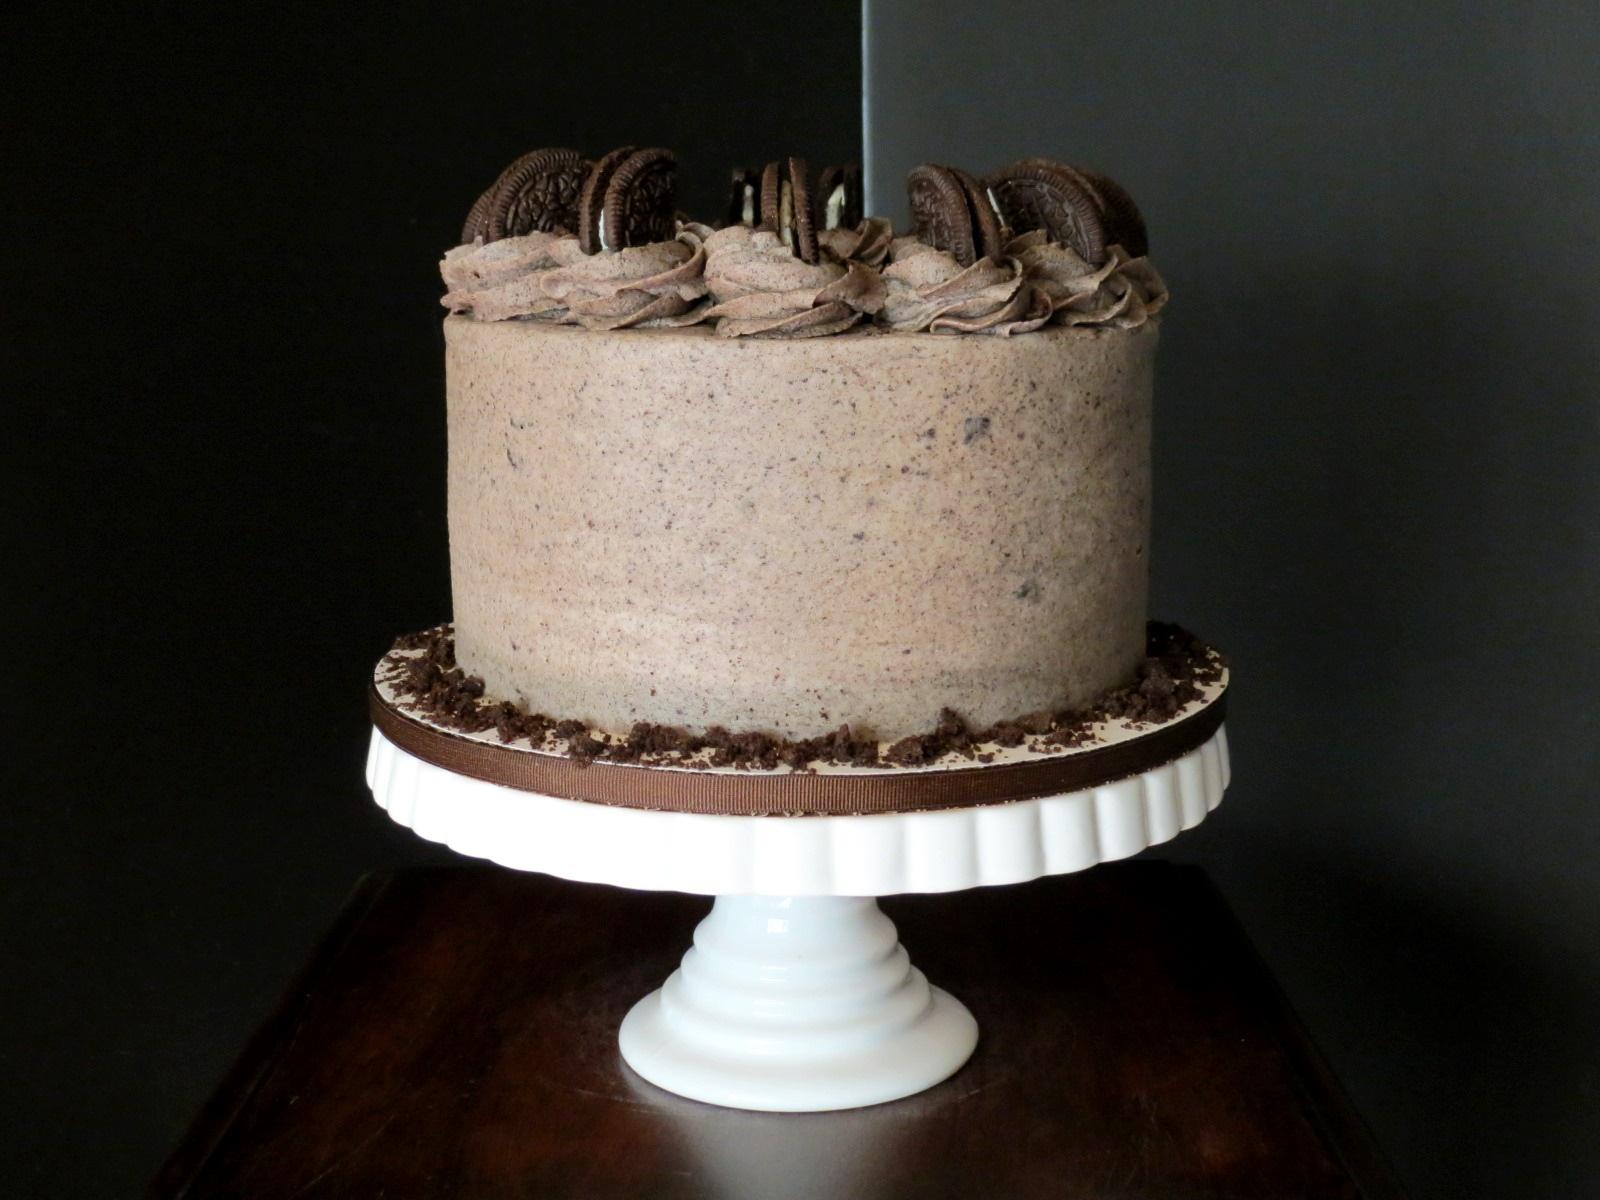 Vegan Cookies And Cream Decadent Chocolate Cake